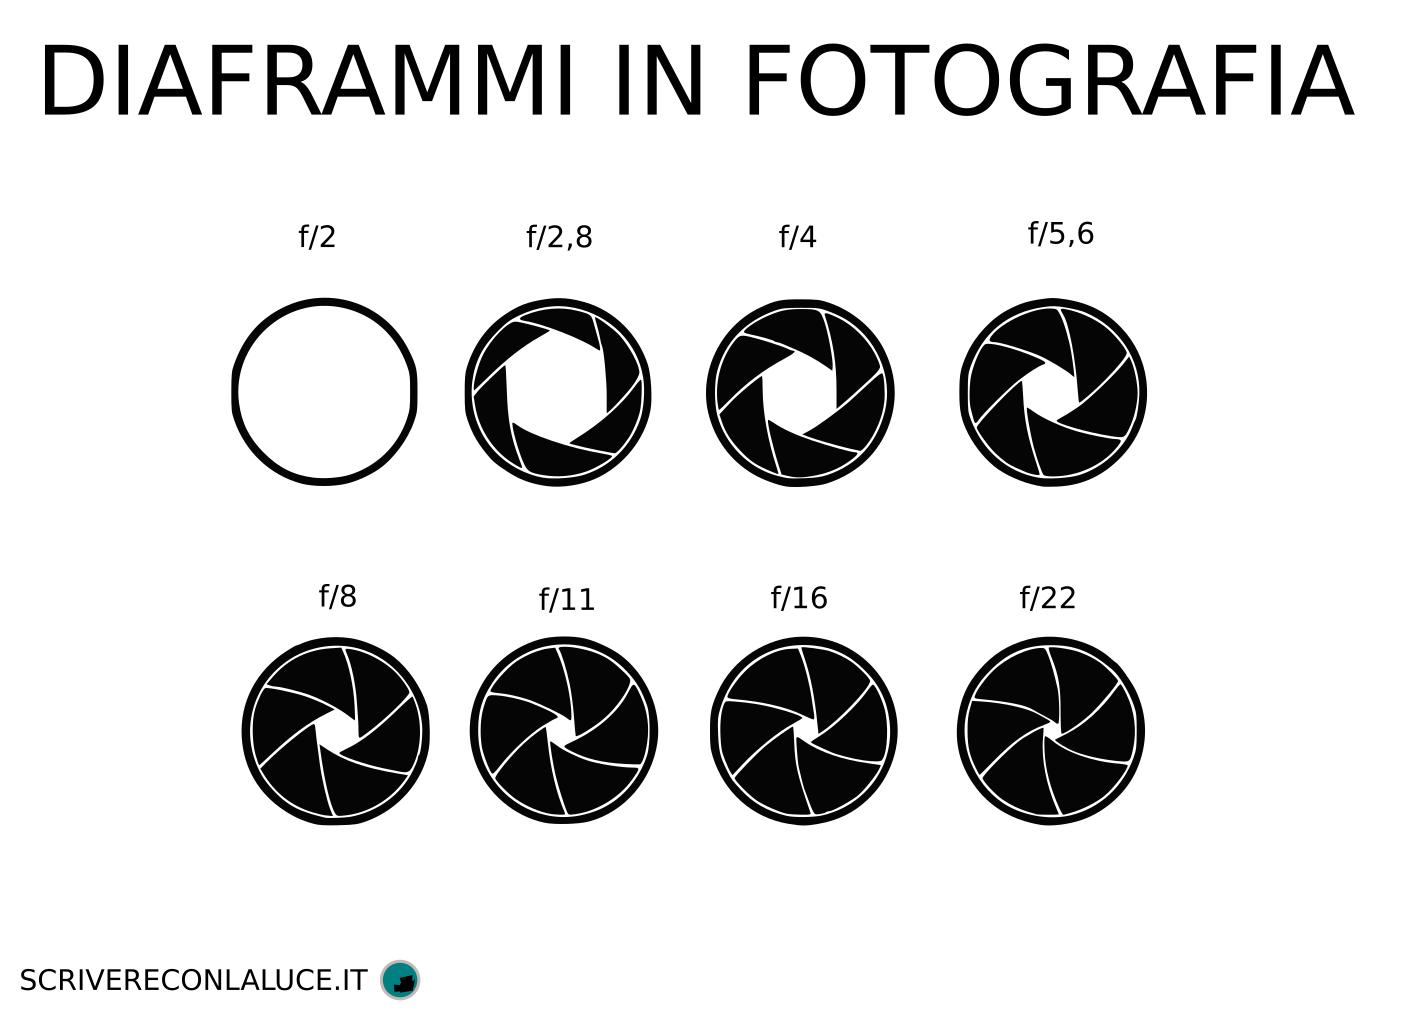 Diaframmi in fotografia